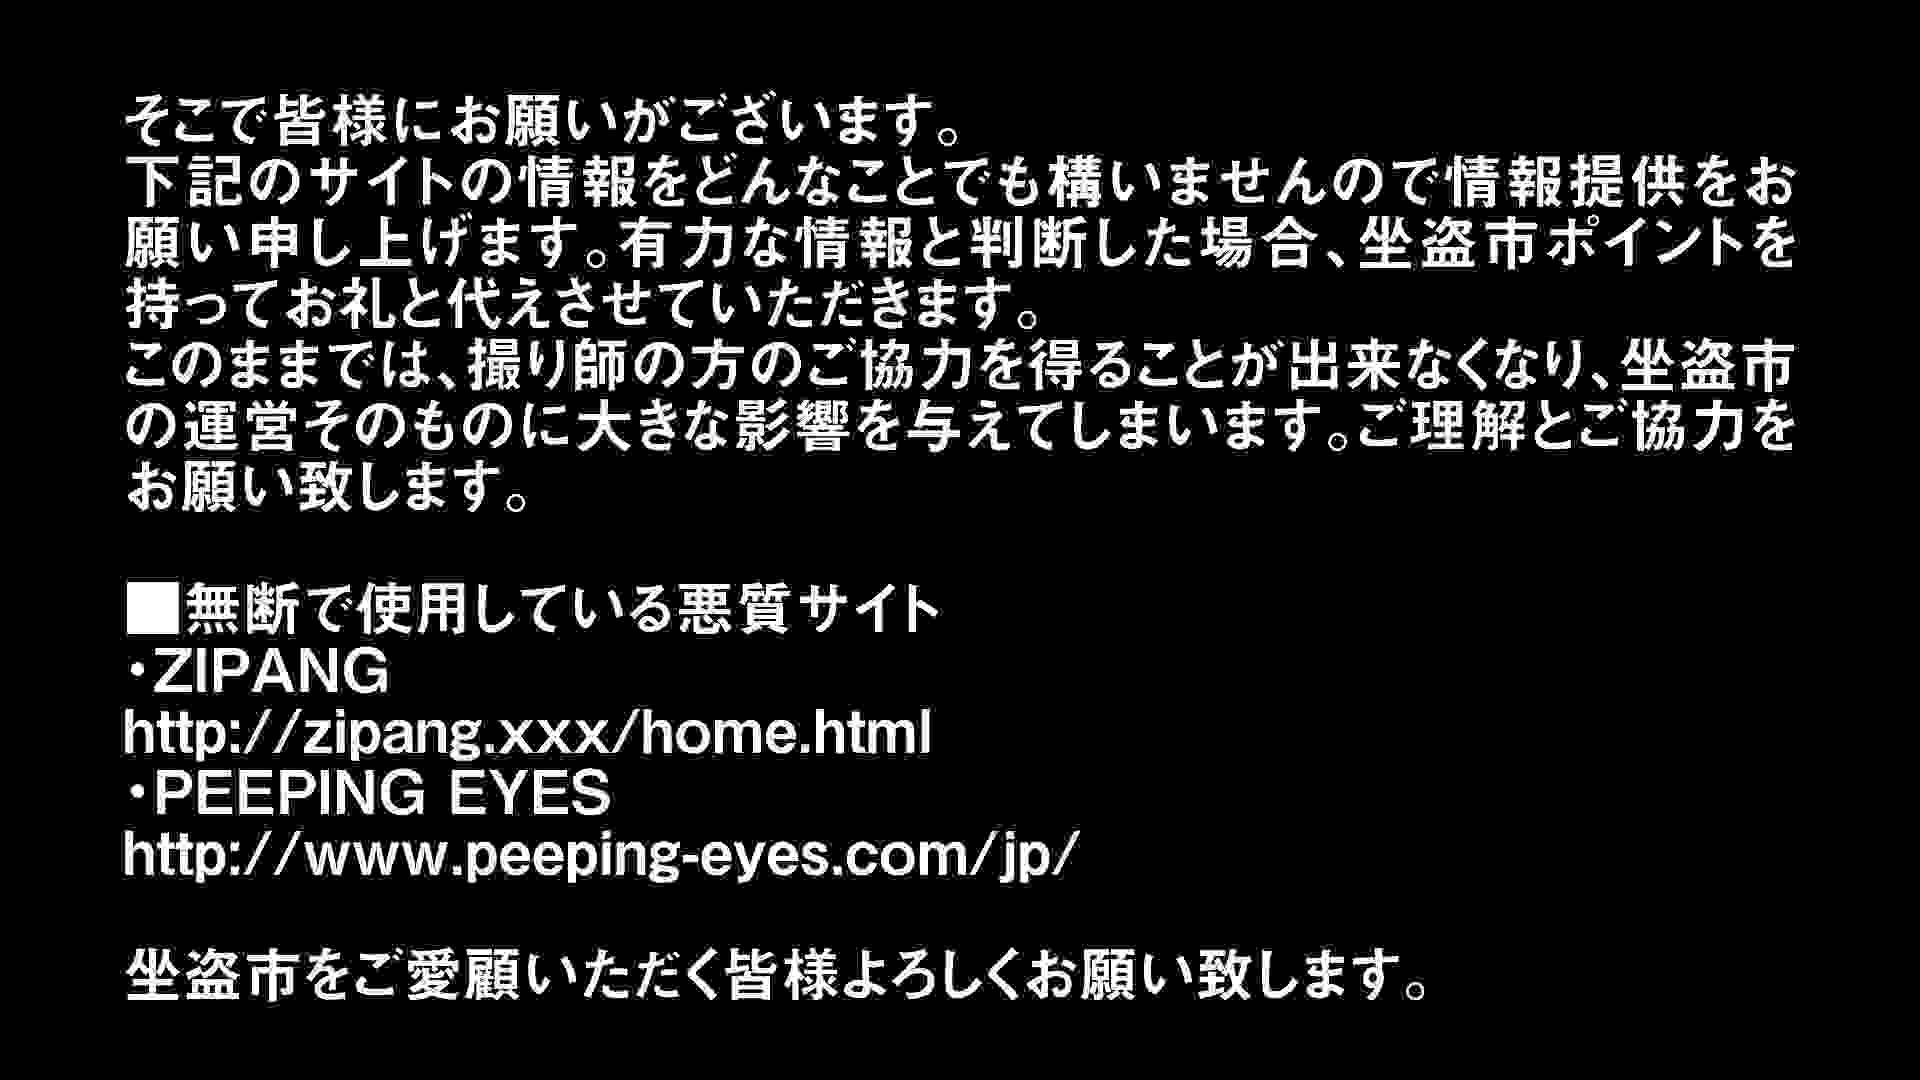 Aquaな露天風呂Vol.296 盗撮 | OLセックス  91画像 34